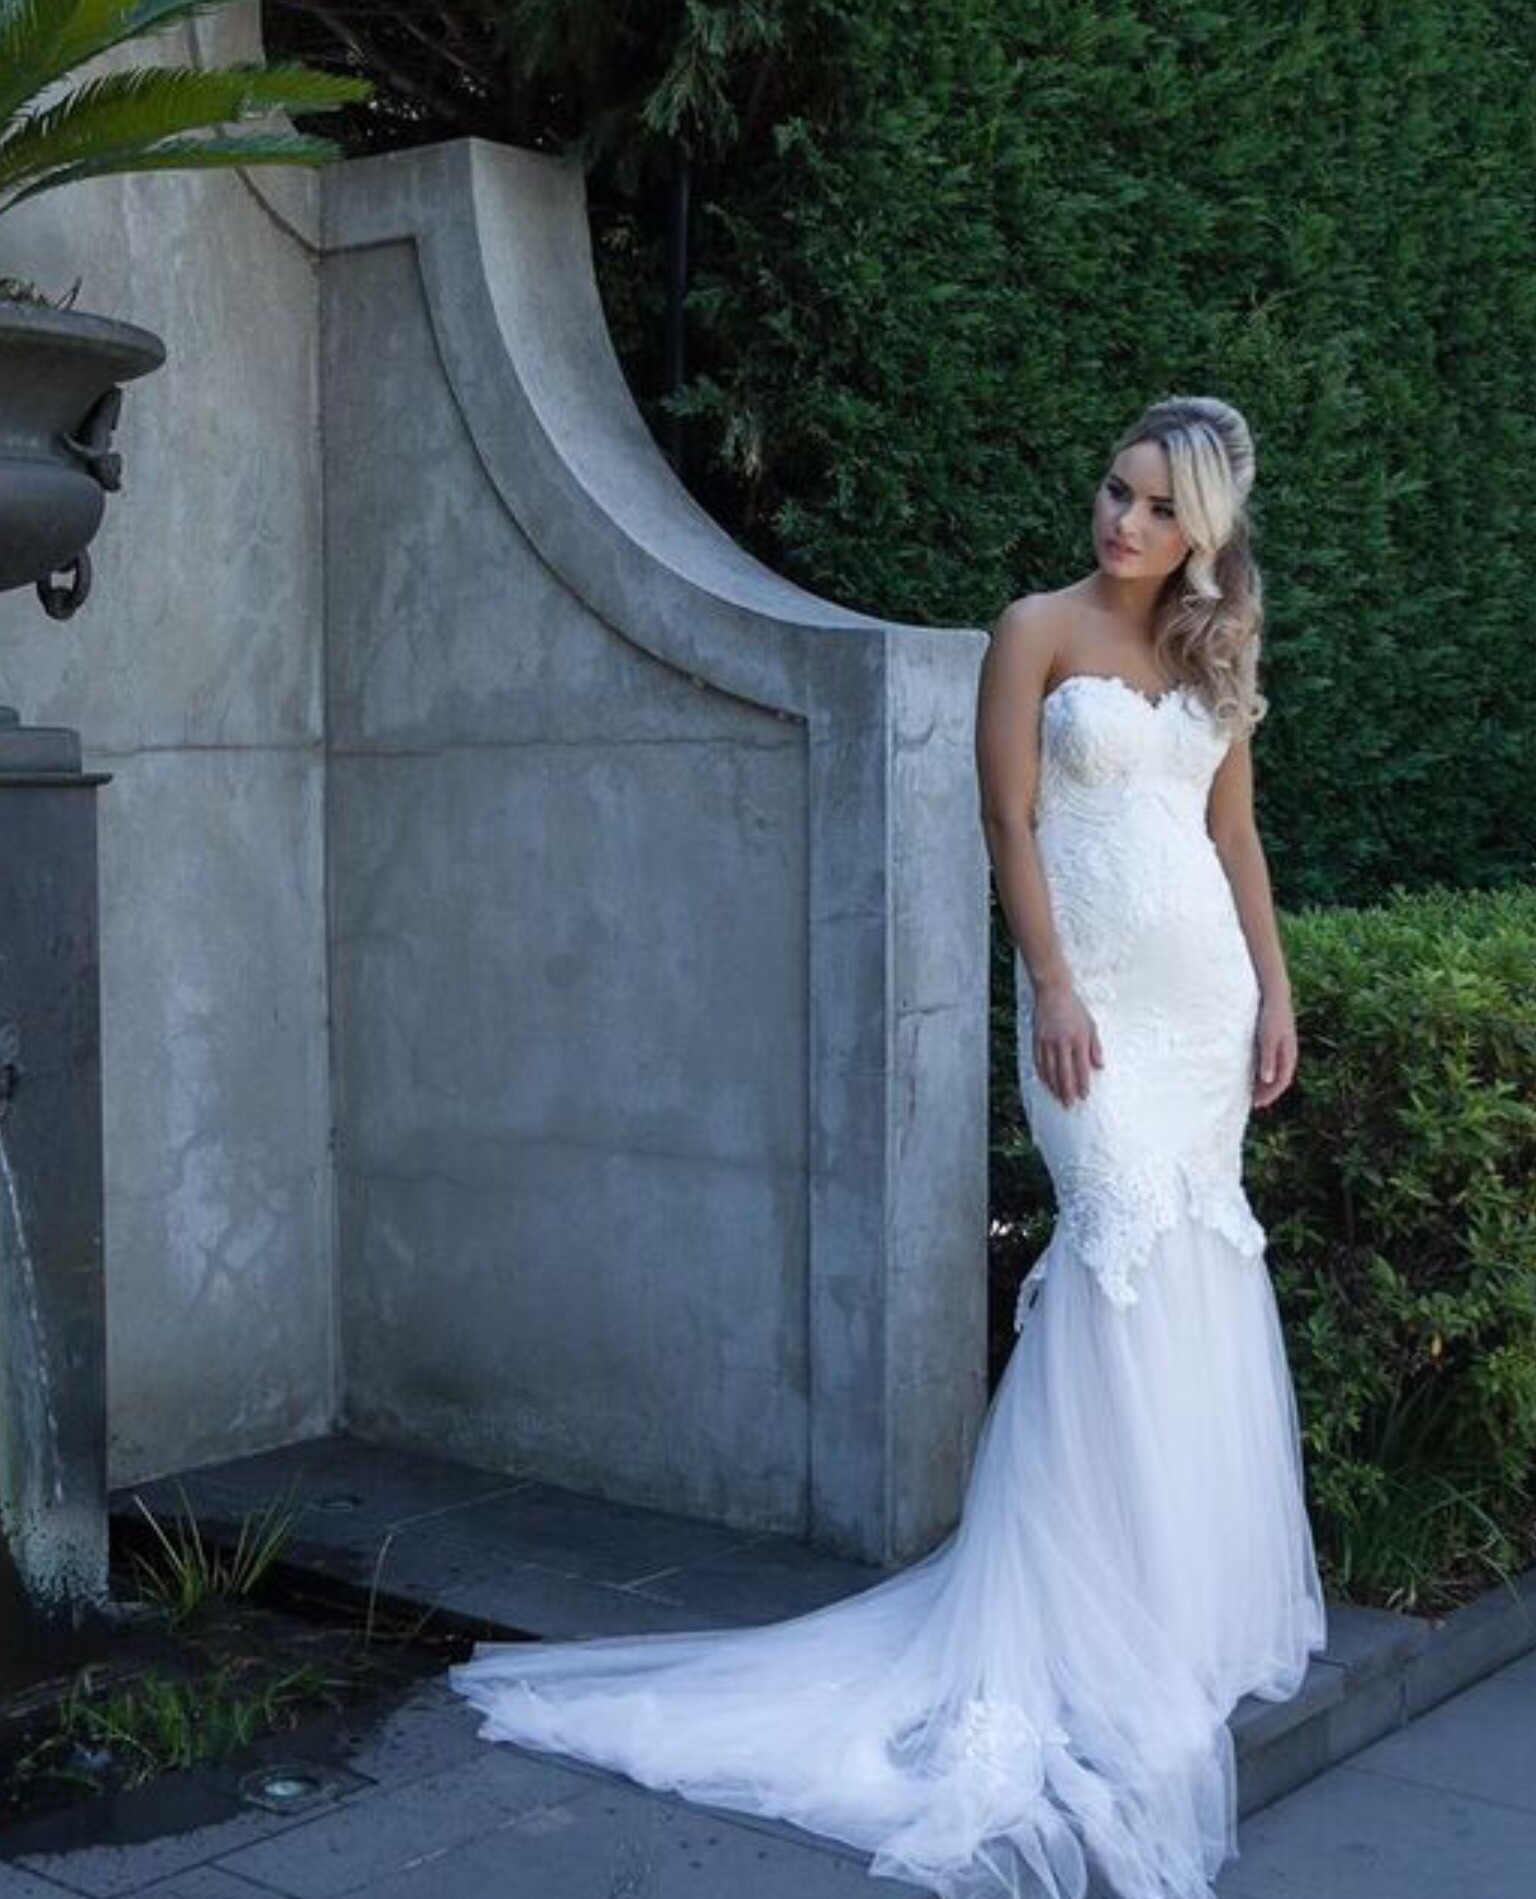 a581f768a28 Zhanel Bridal Couture Ready To Wear Designer Range. New Wedding Dress on  Sale 66% Off - Stillwhite United Kingdom